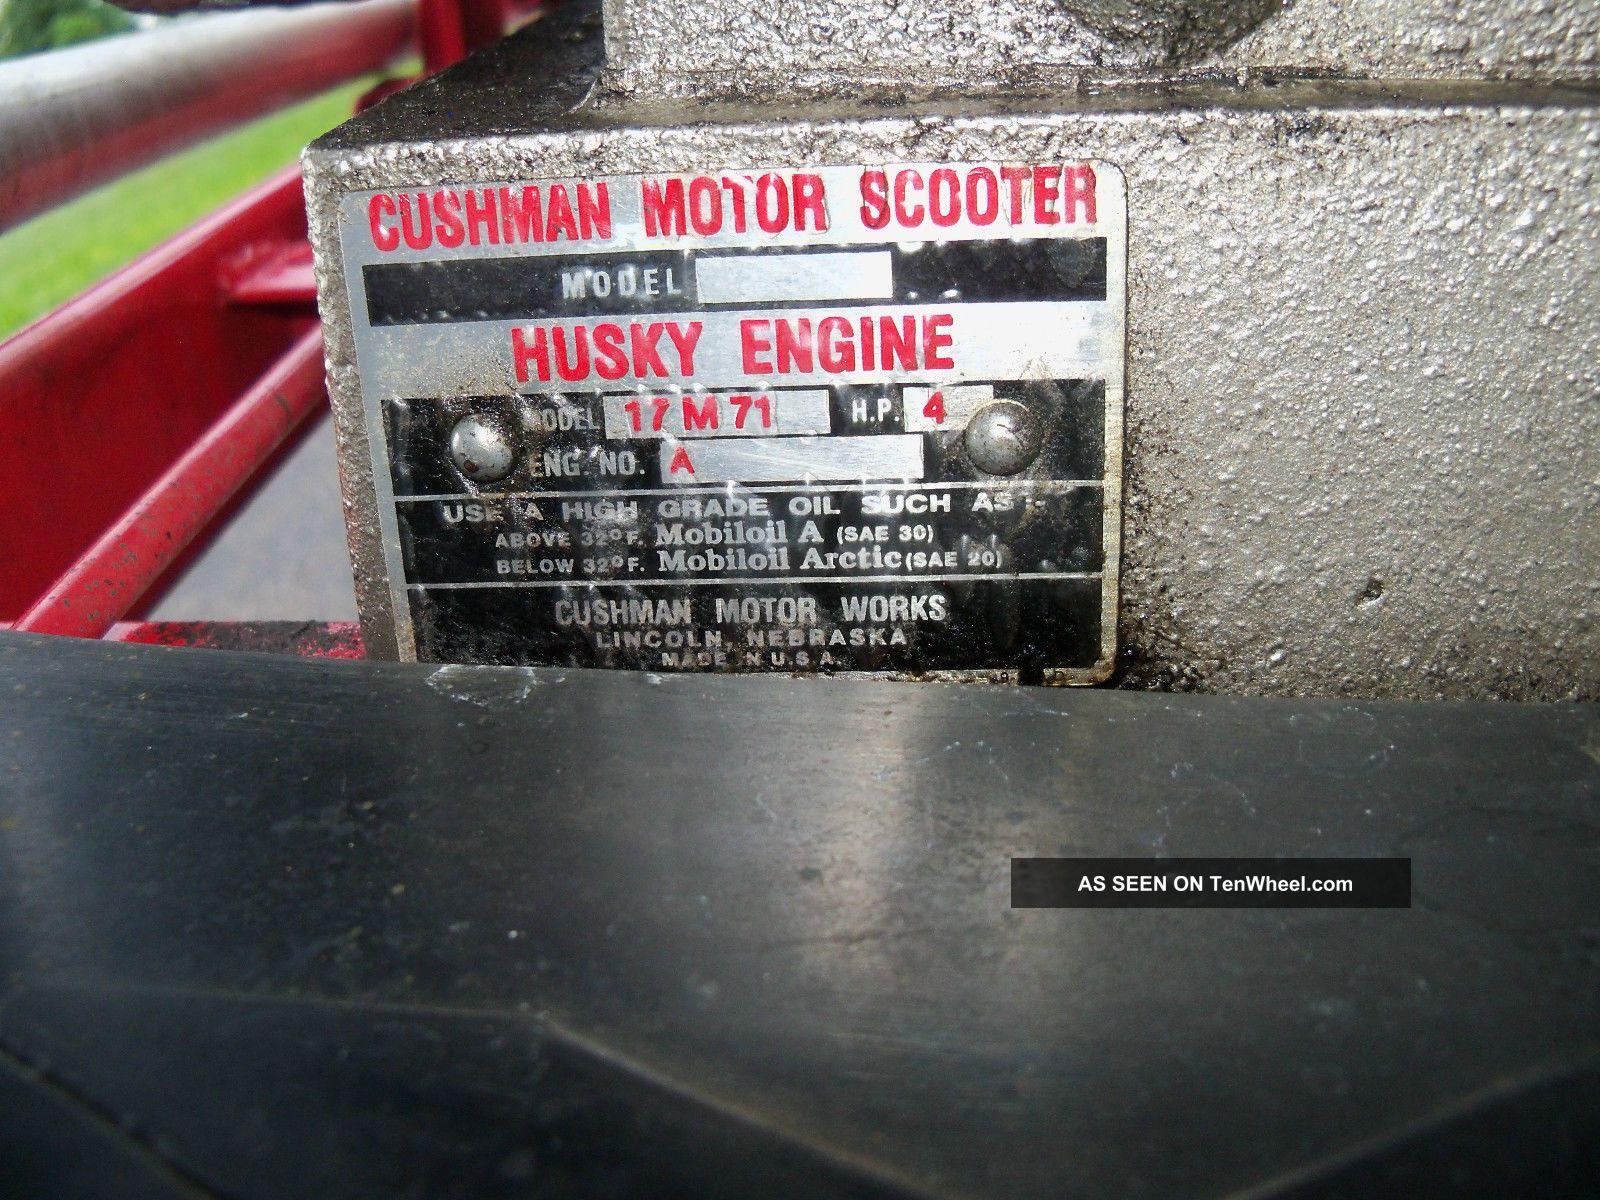 ... 1948 Cushman Motor Scooter Military Cushman photo 12